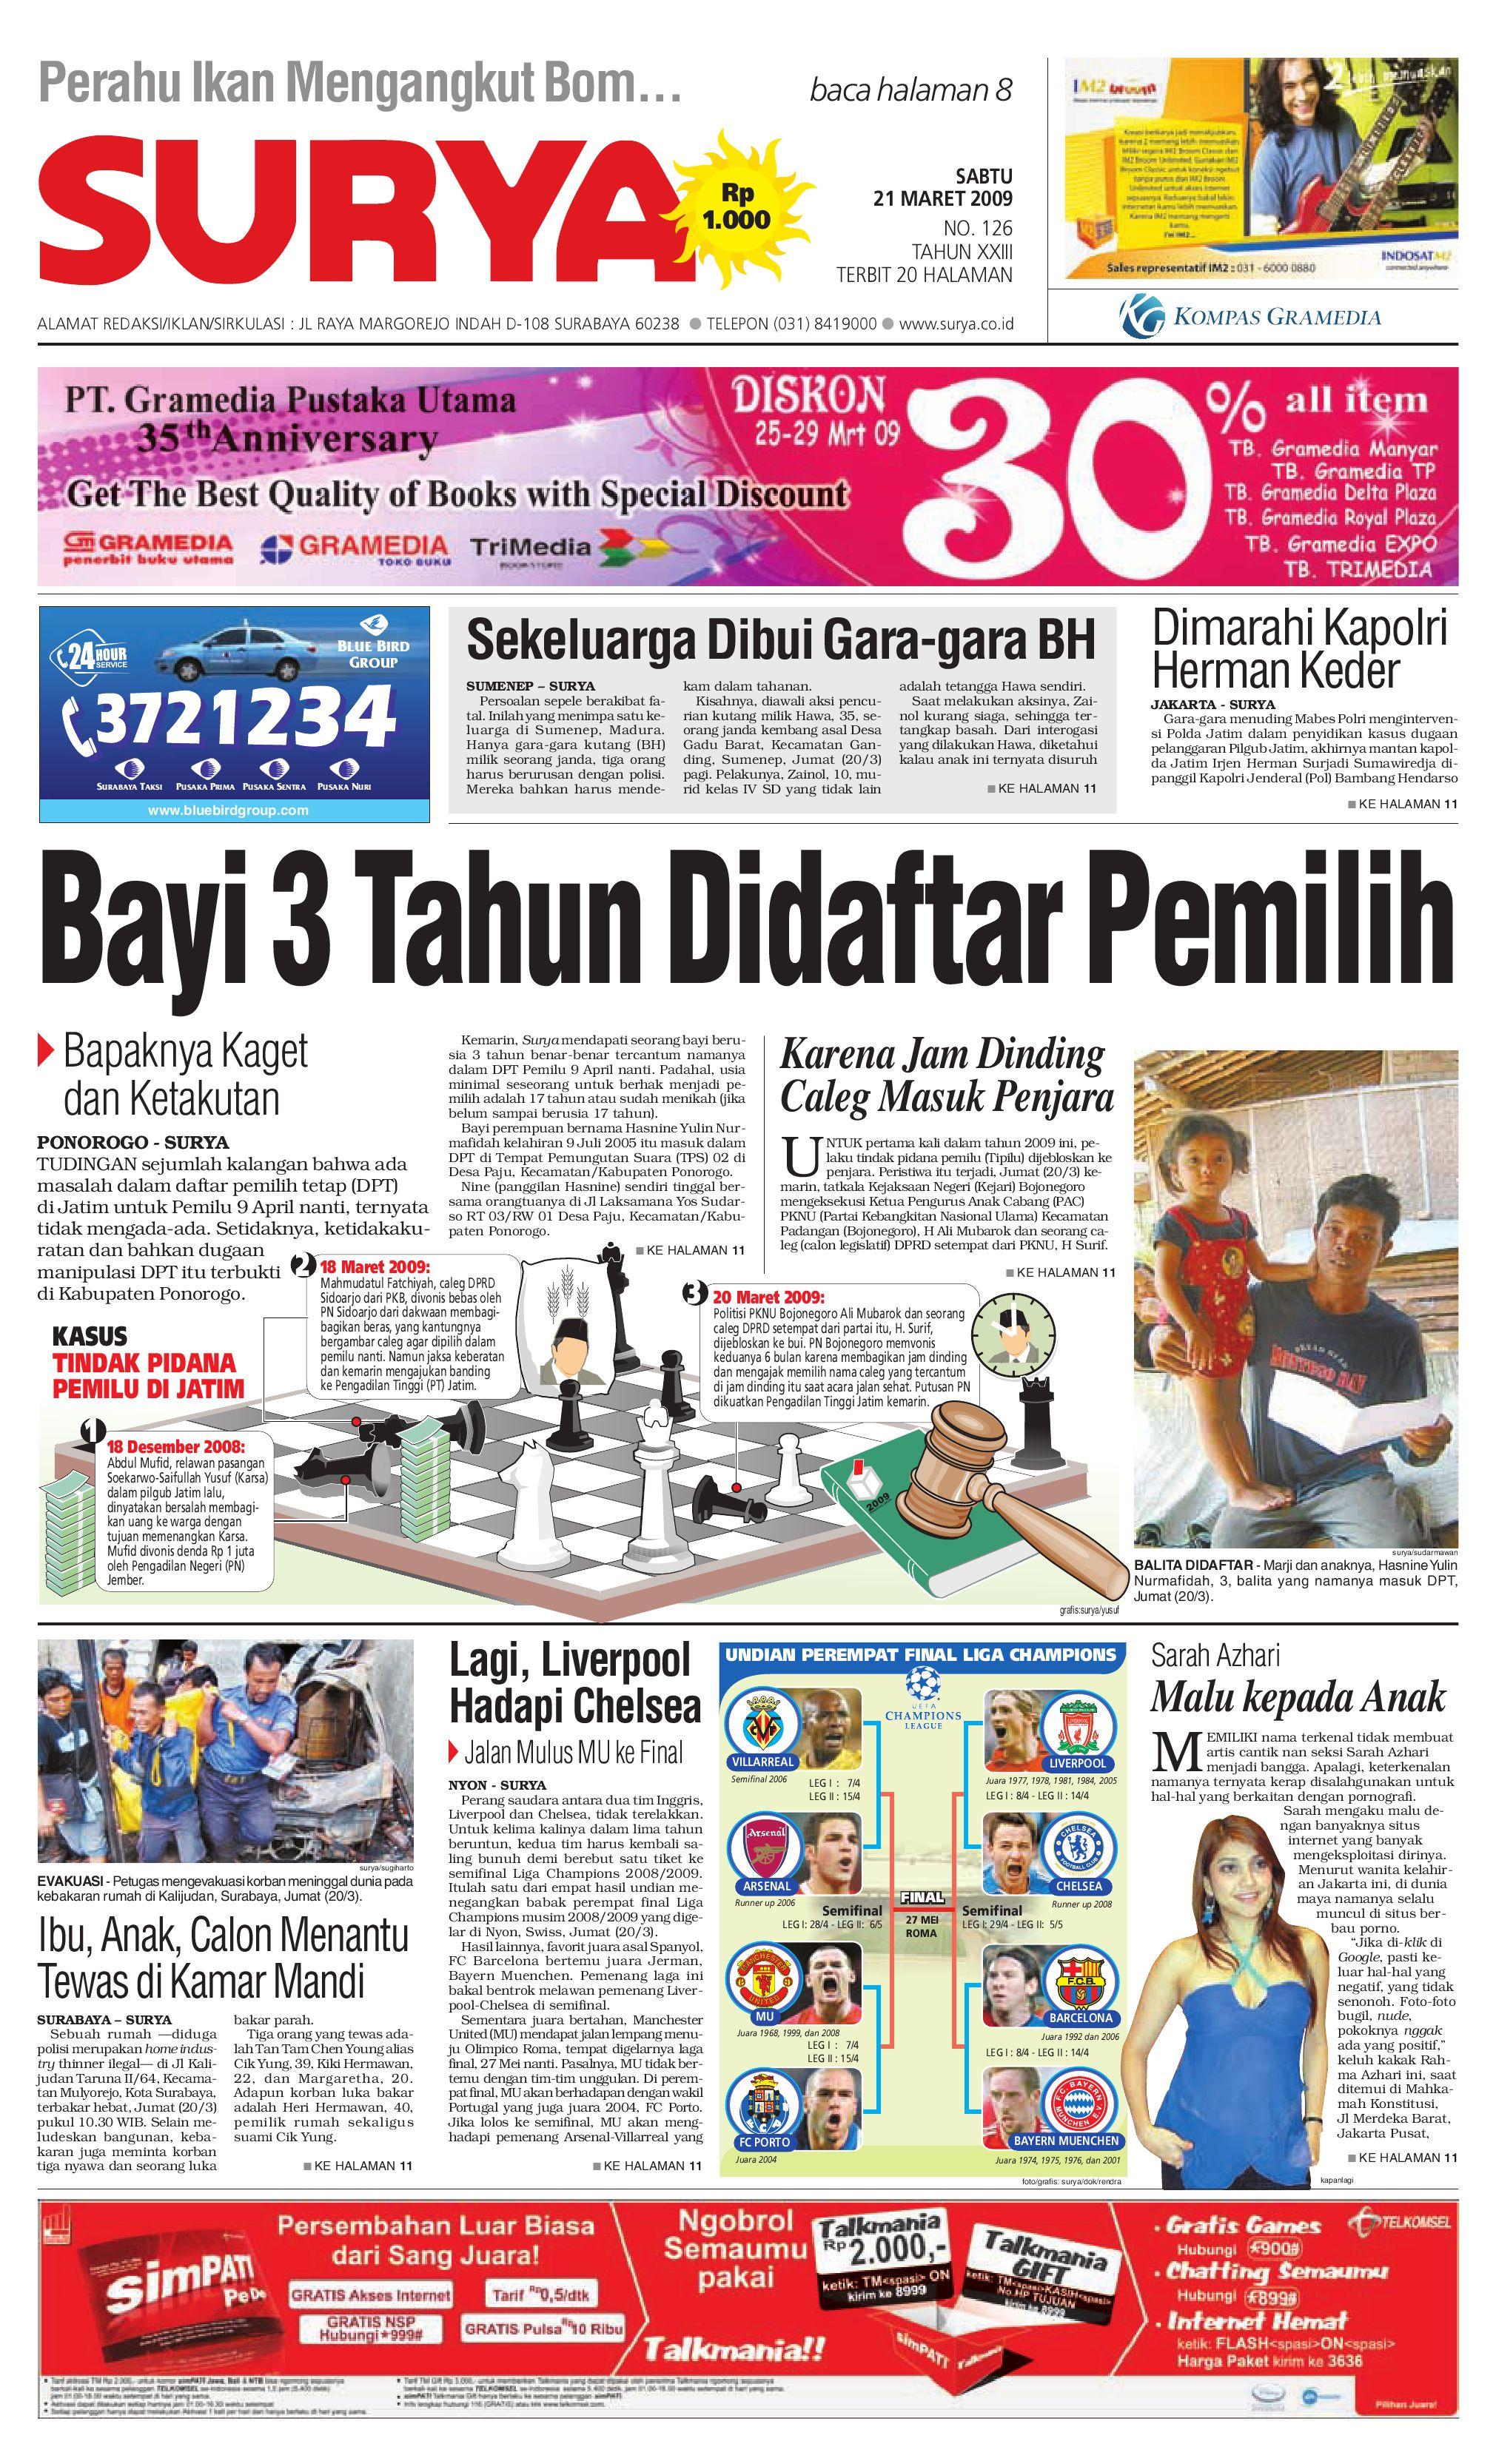 surya edisi cetak 24 juli 2010 by harian surya issuu